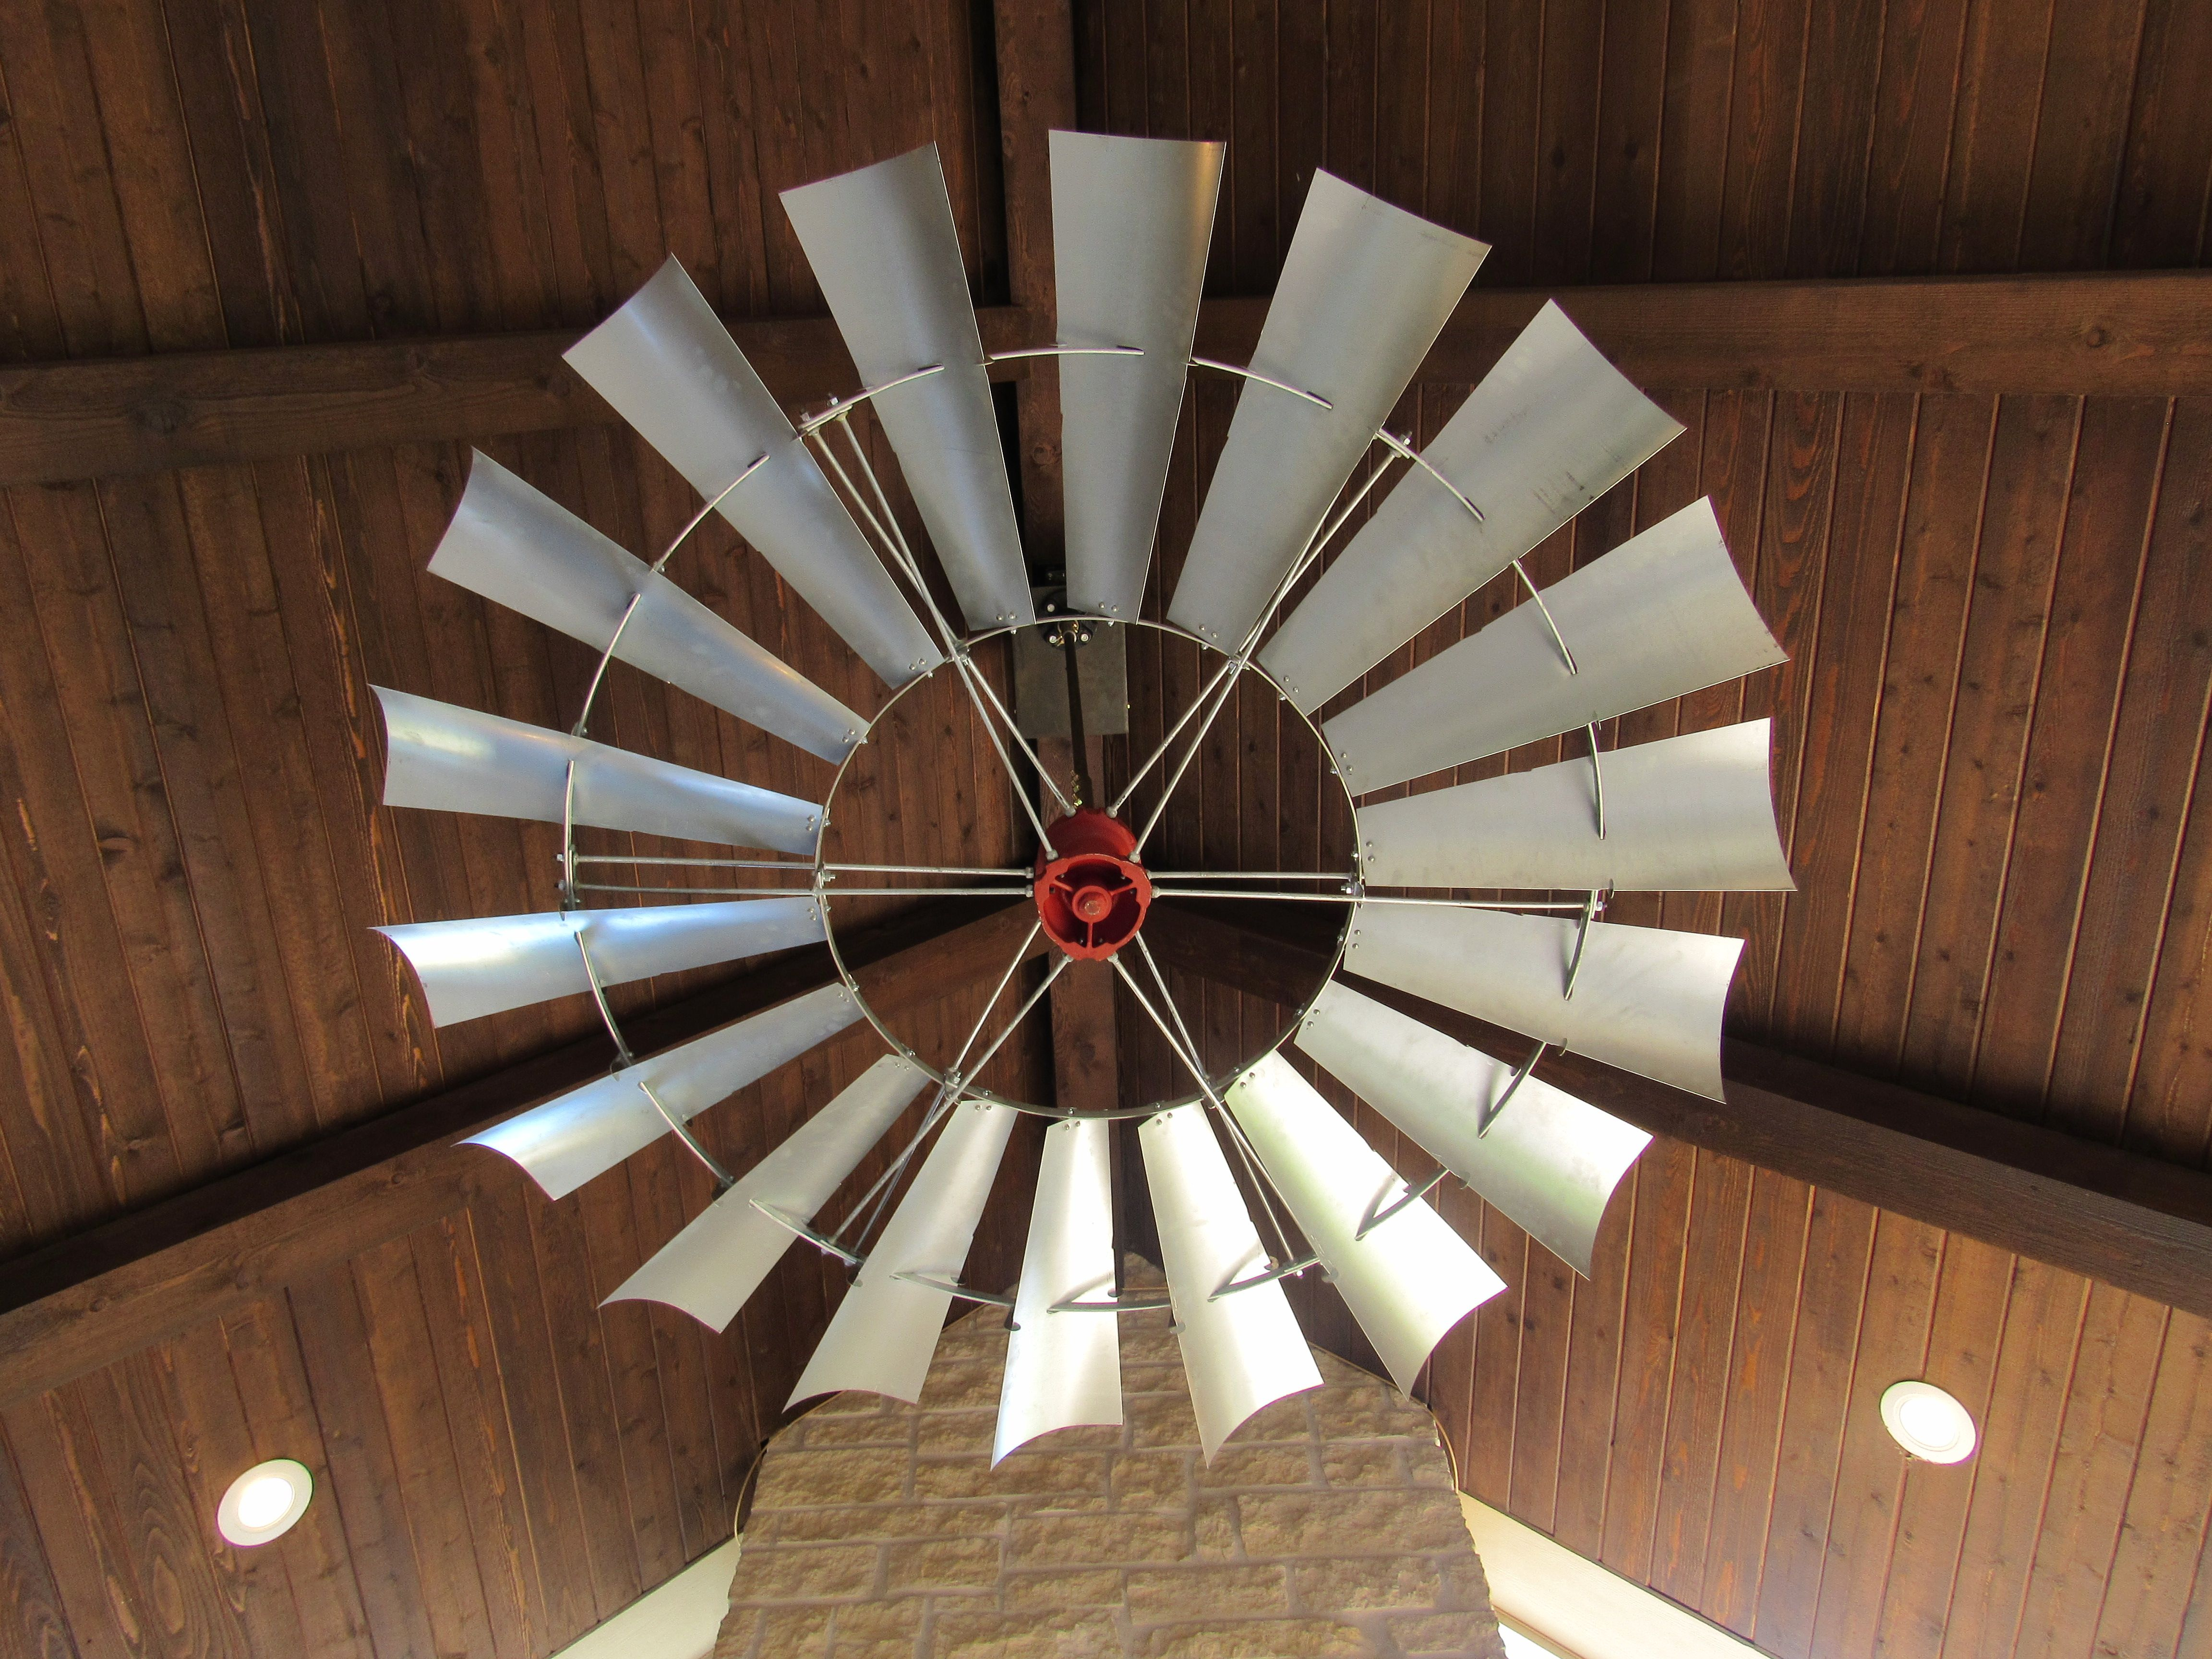 6 New Aermotor Windmill Ceiling Fan Outdoor Patio Windmill